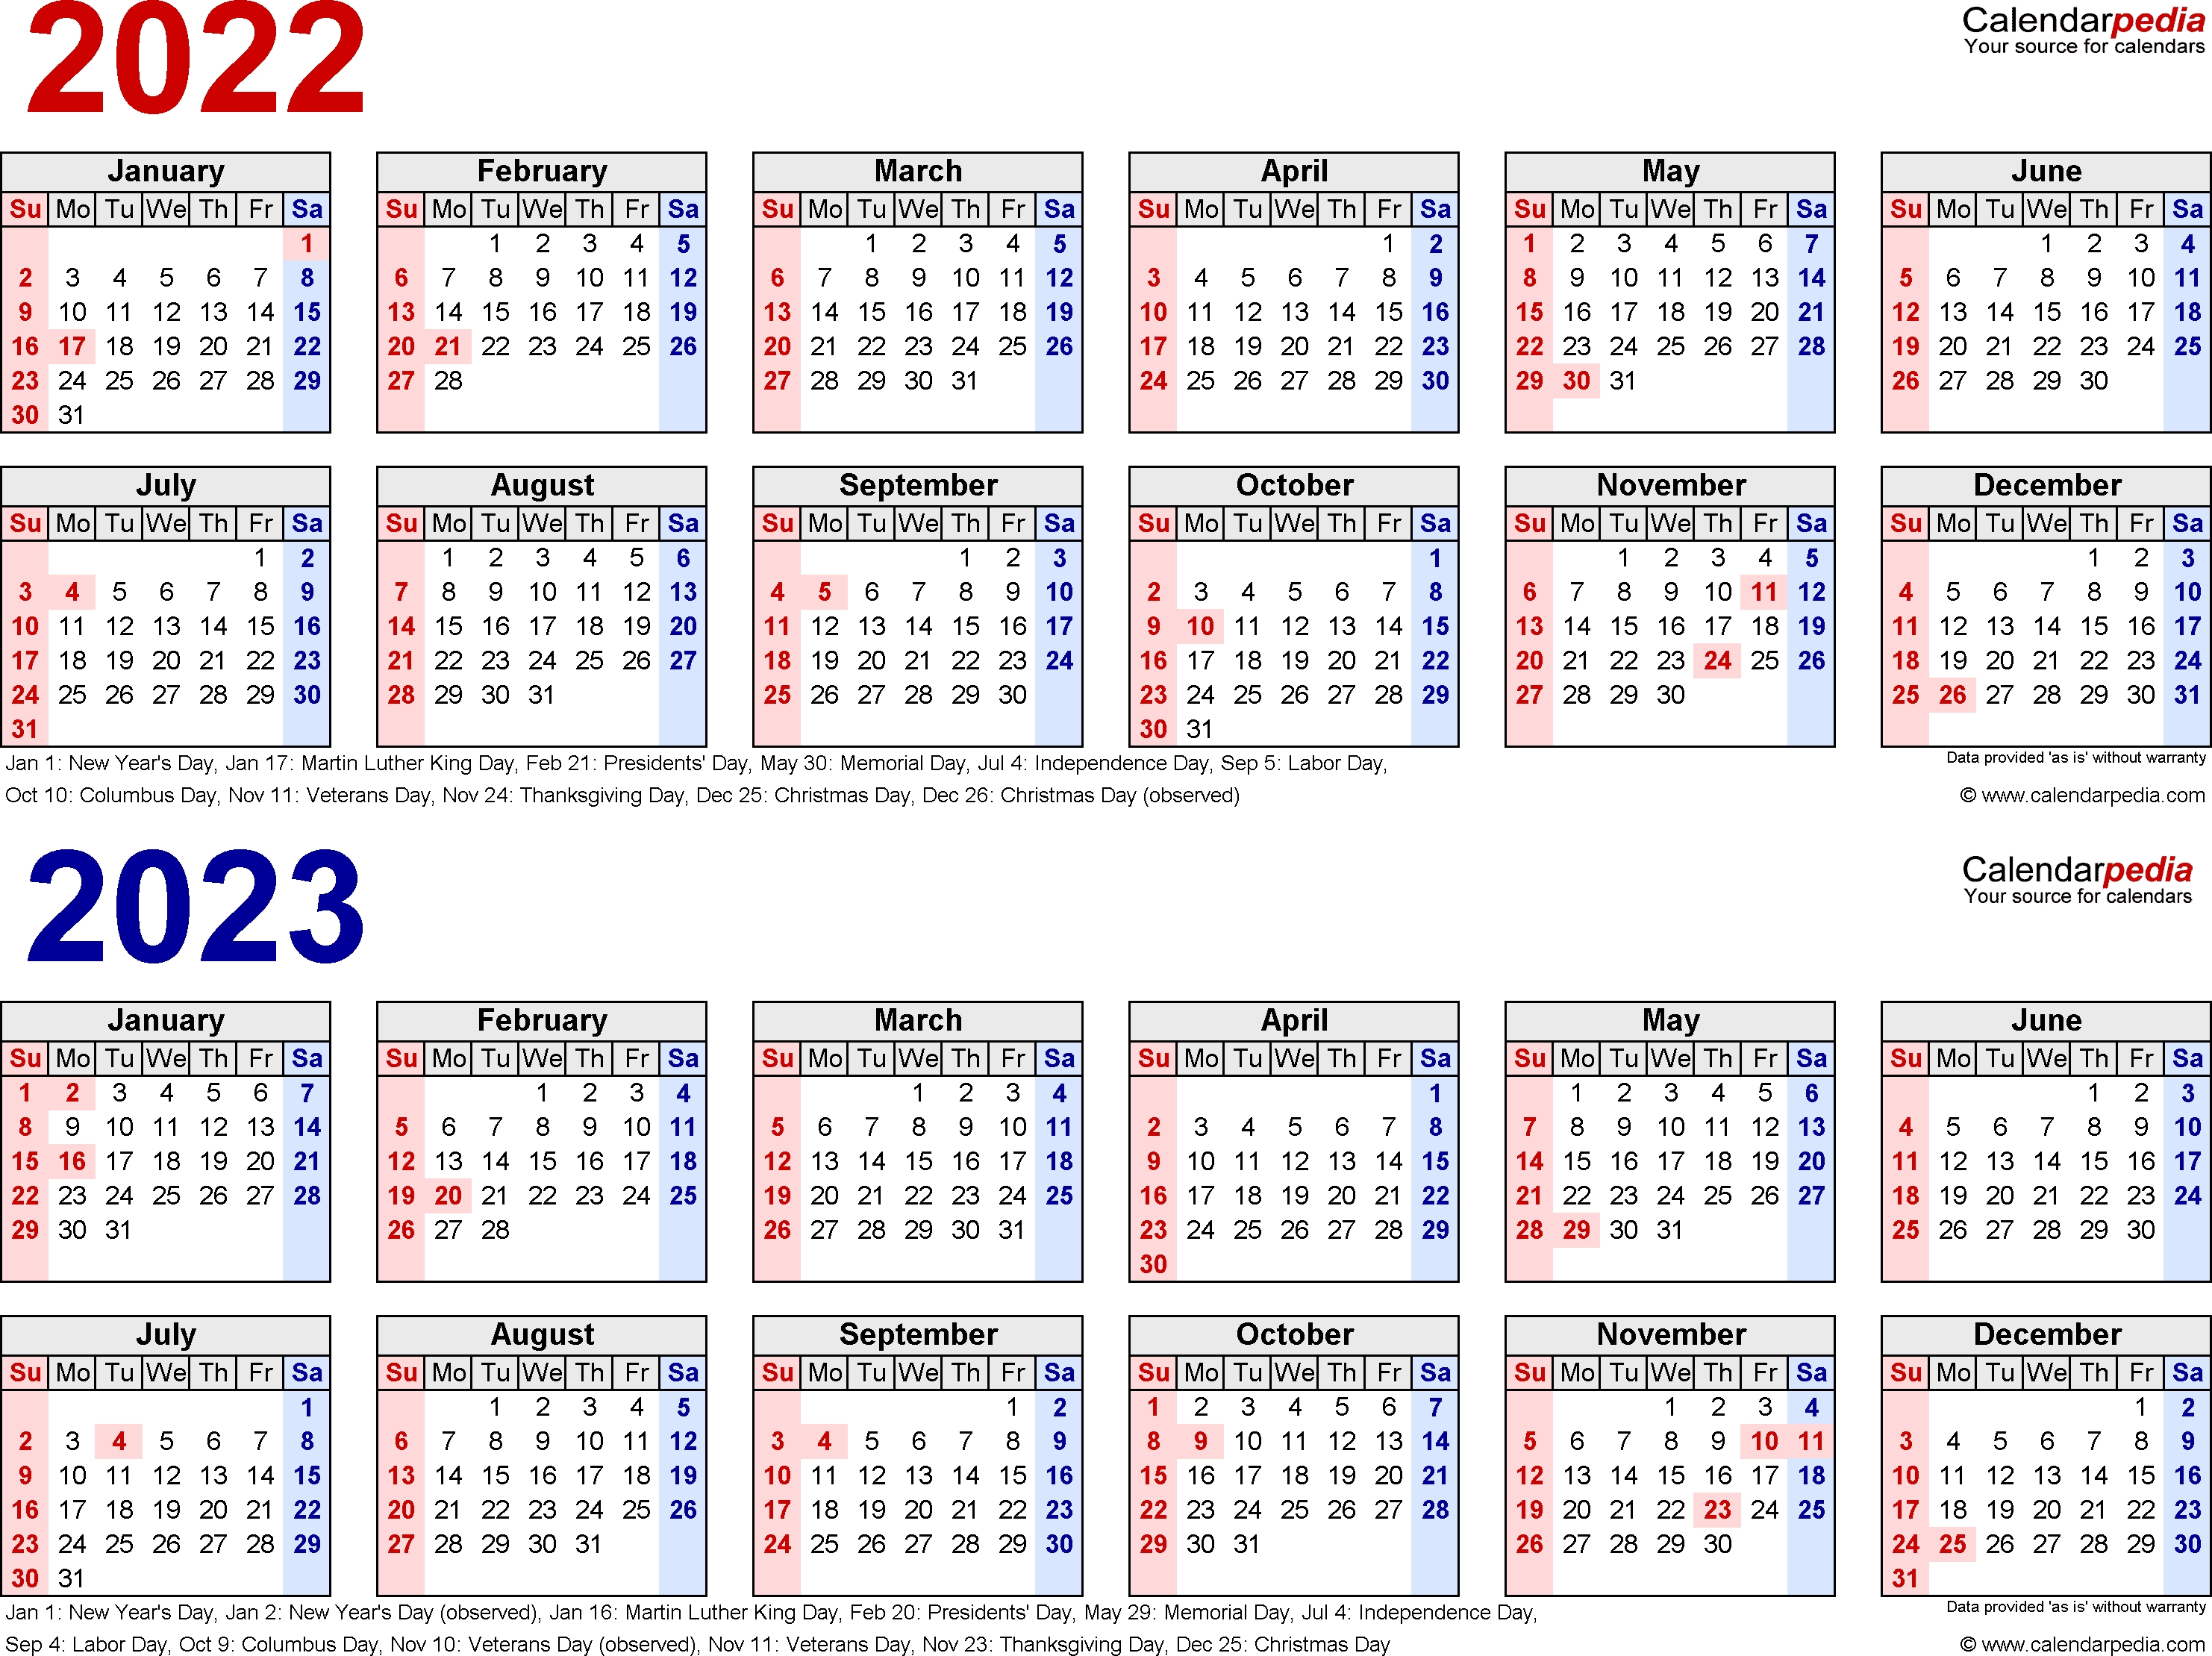 2022-2023 Calendar - Free Printable Two-Year Word Calendars within Blank Year Long Calendar 2022